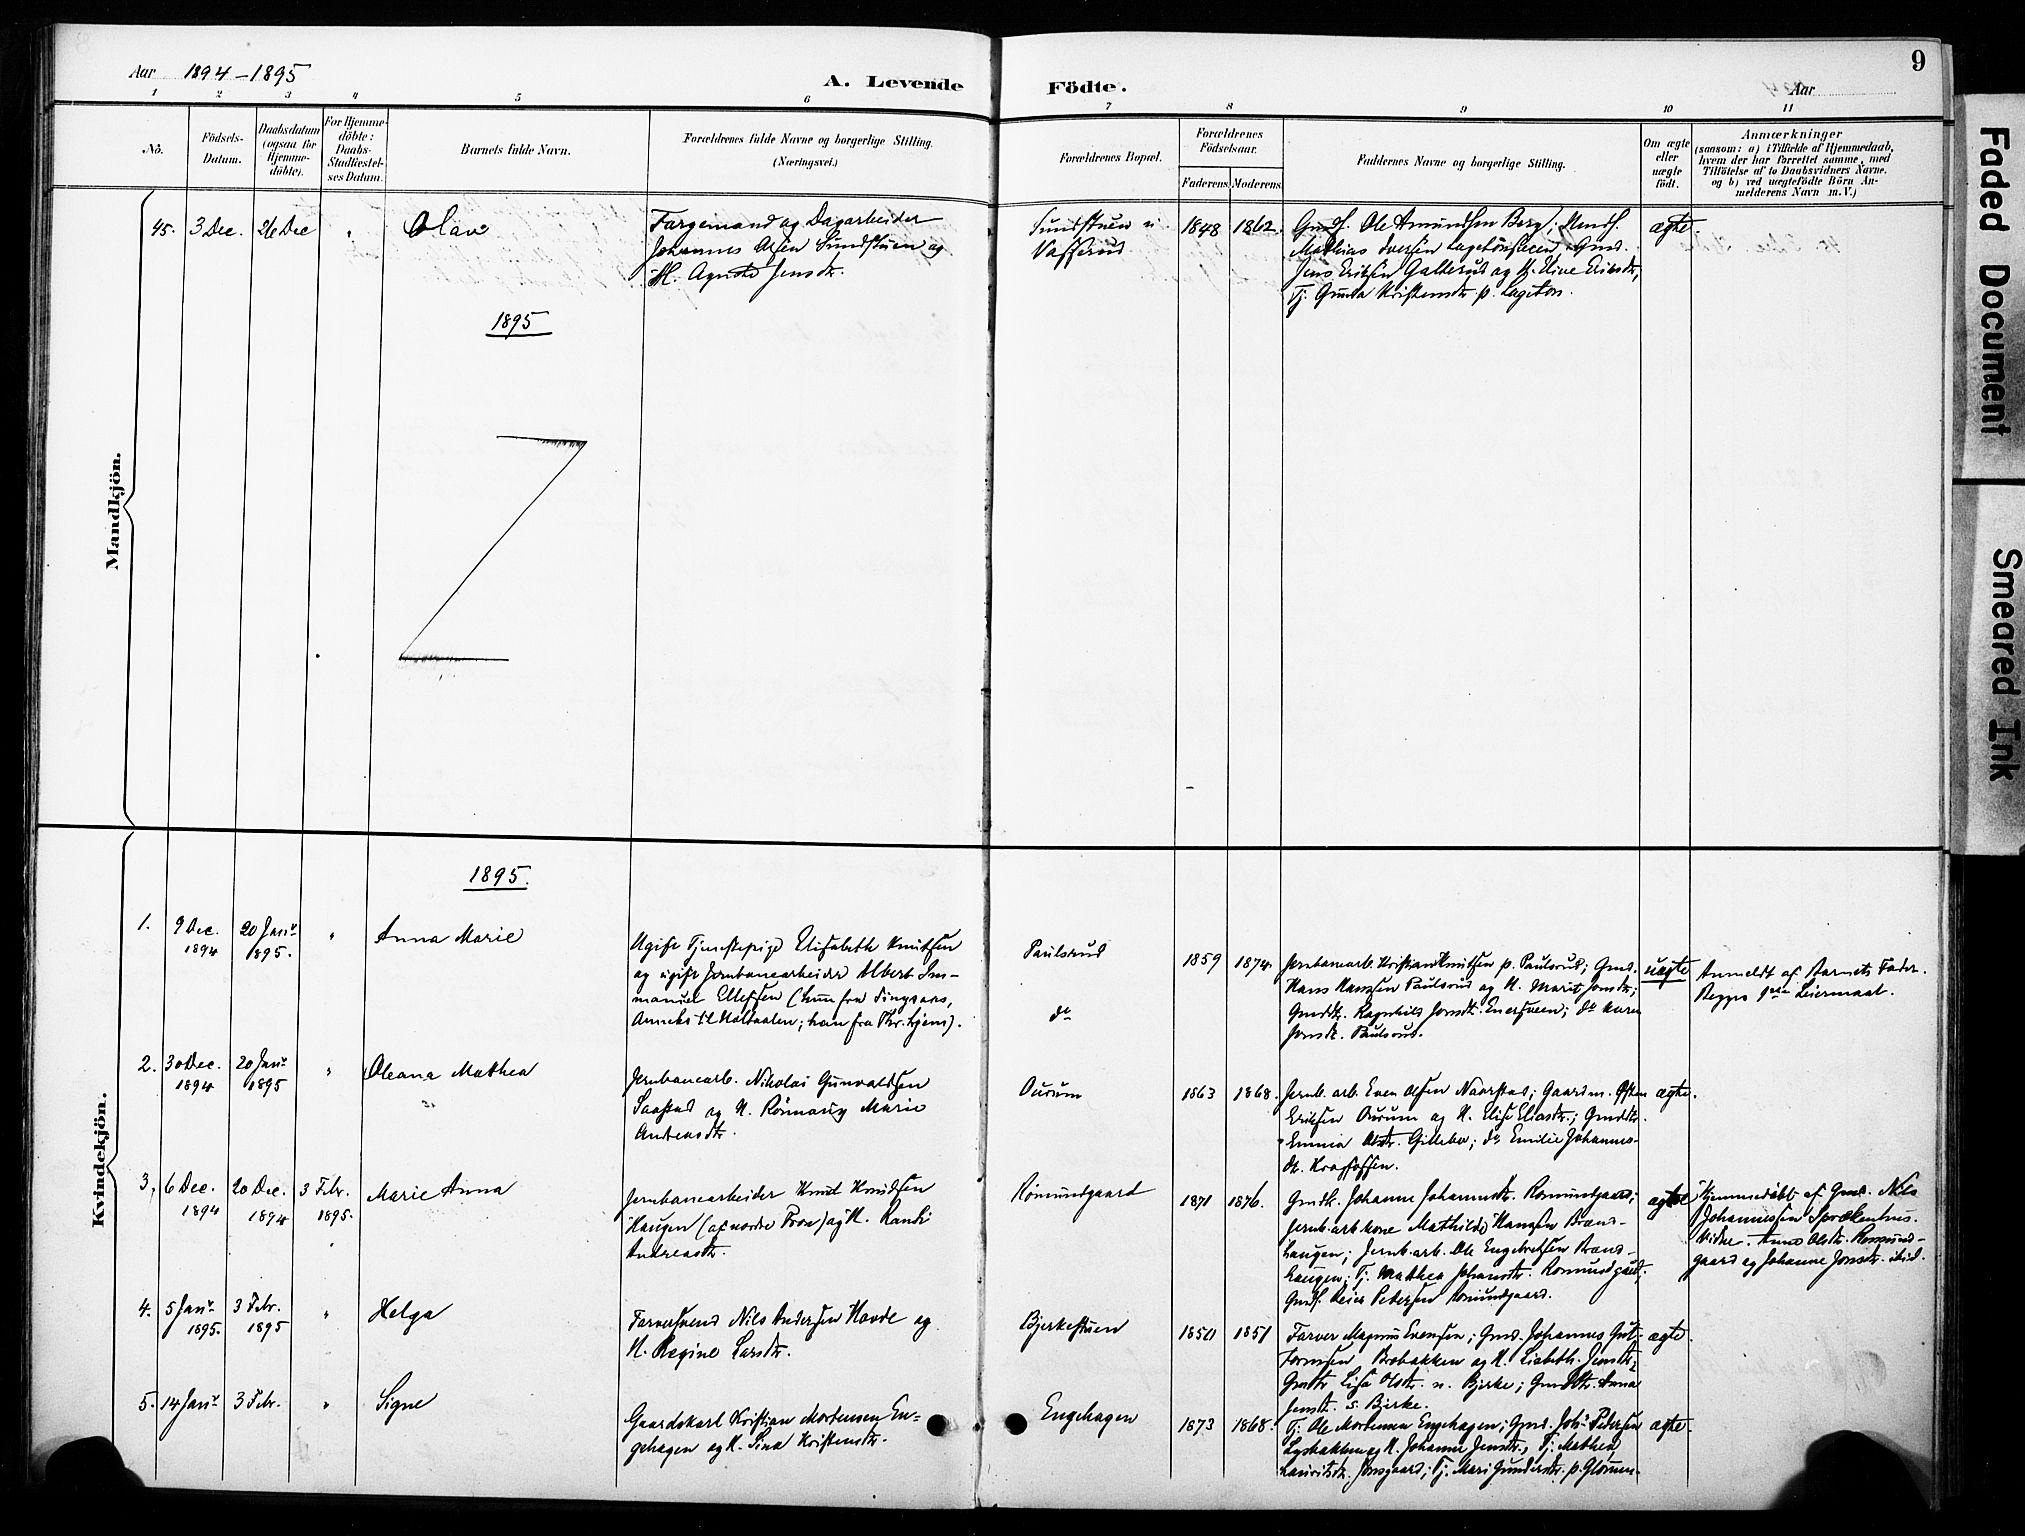 SAH, Øyer prestekontor, Ministerialbok nr. 11, 1894-1905, s. 9